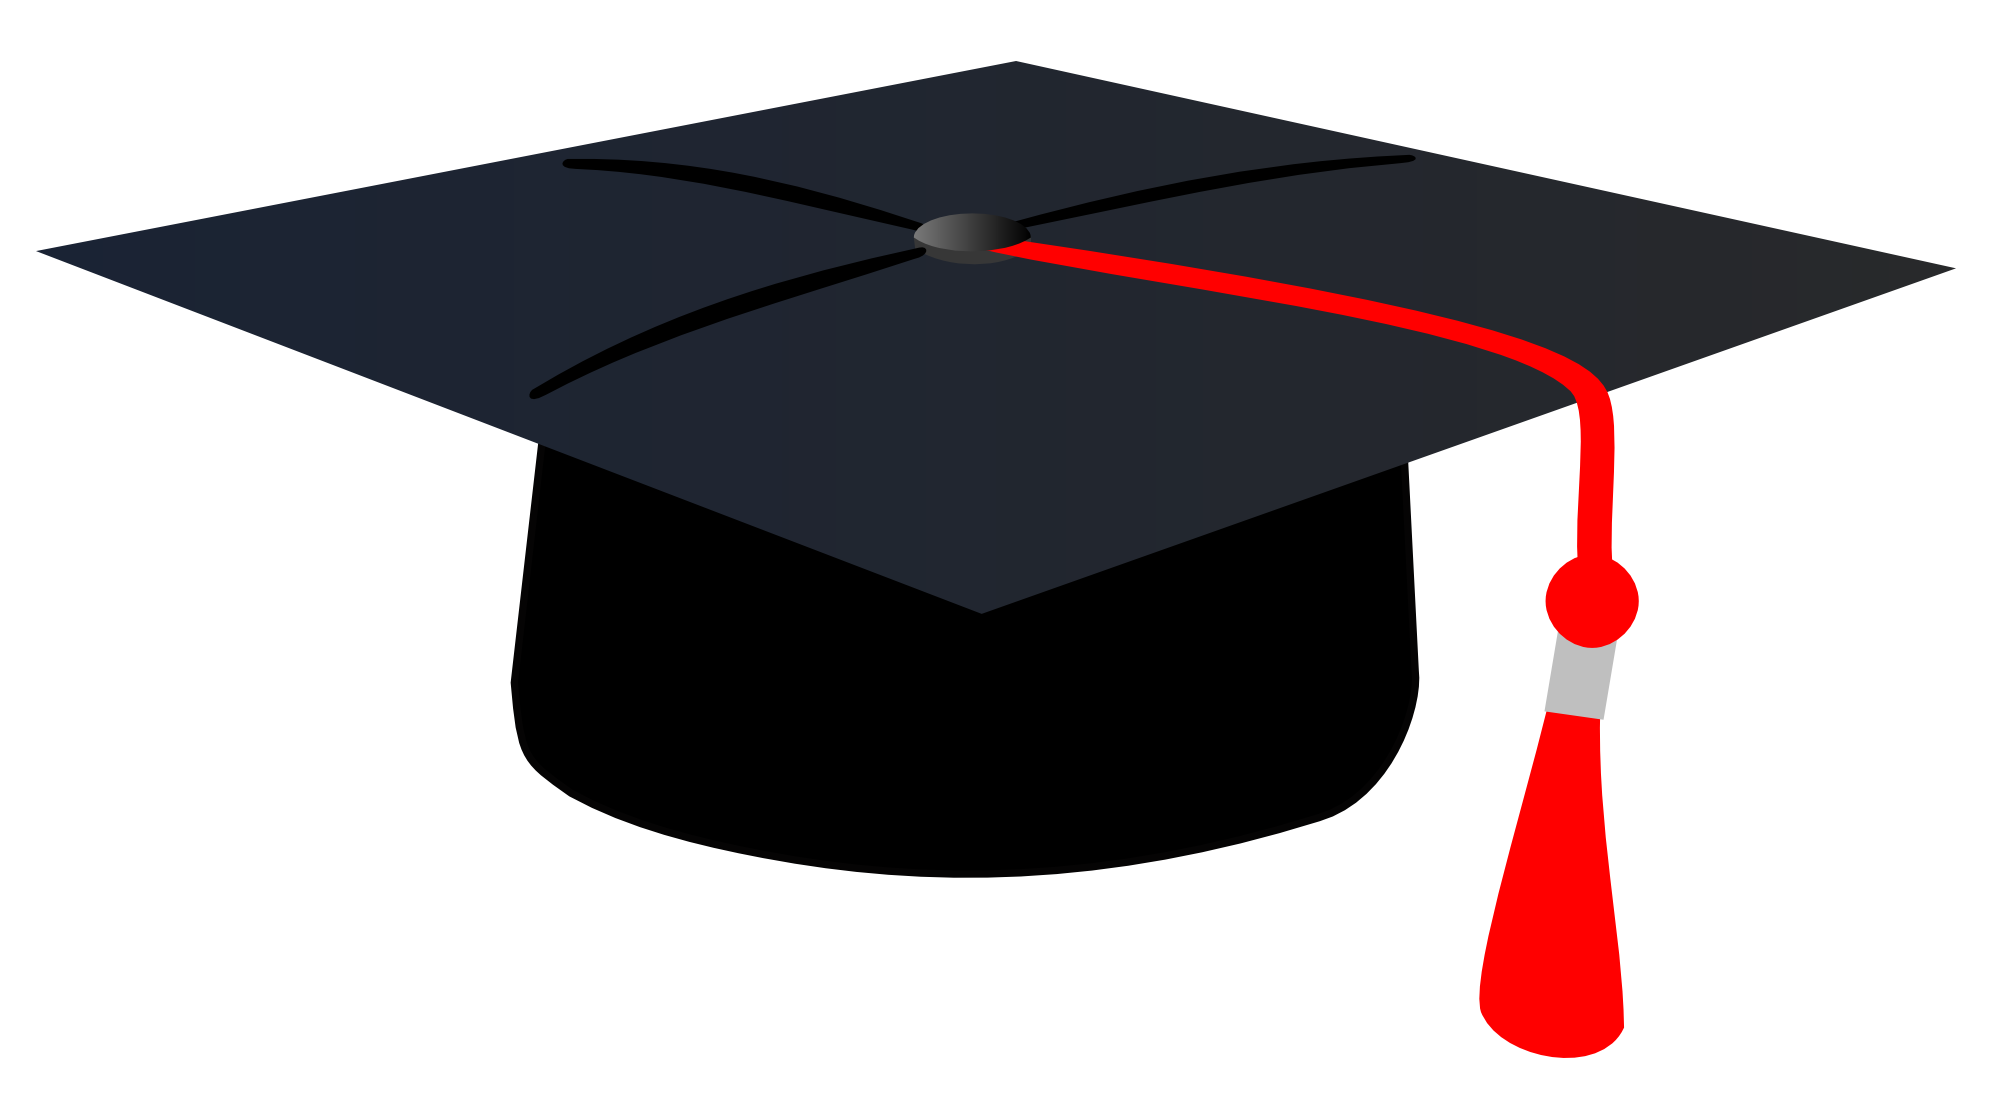 graduation cap clipart png image purepng free transparent cc0 rh purepng com graduation hat clipart black and white graduation hat clip art to download